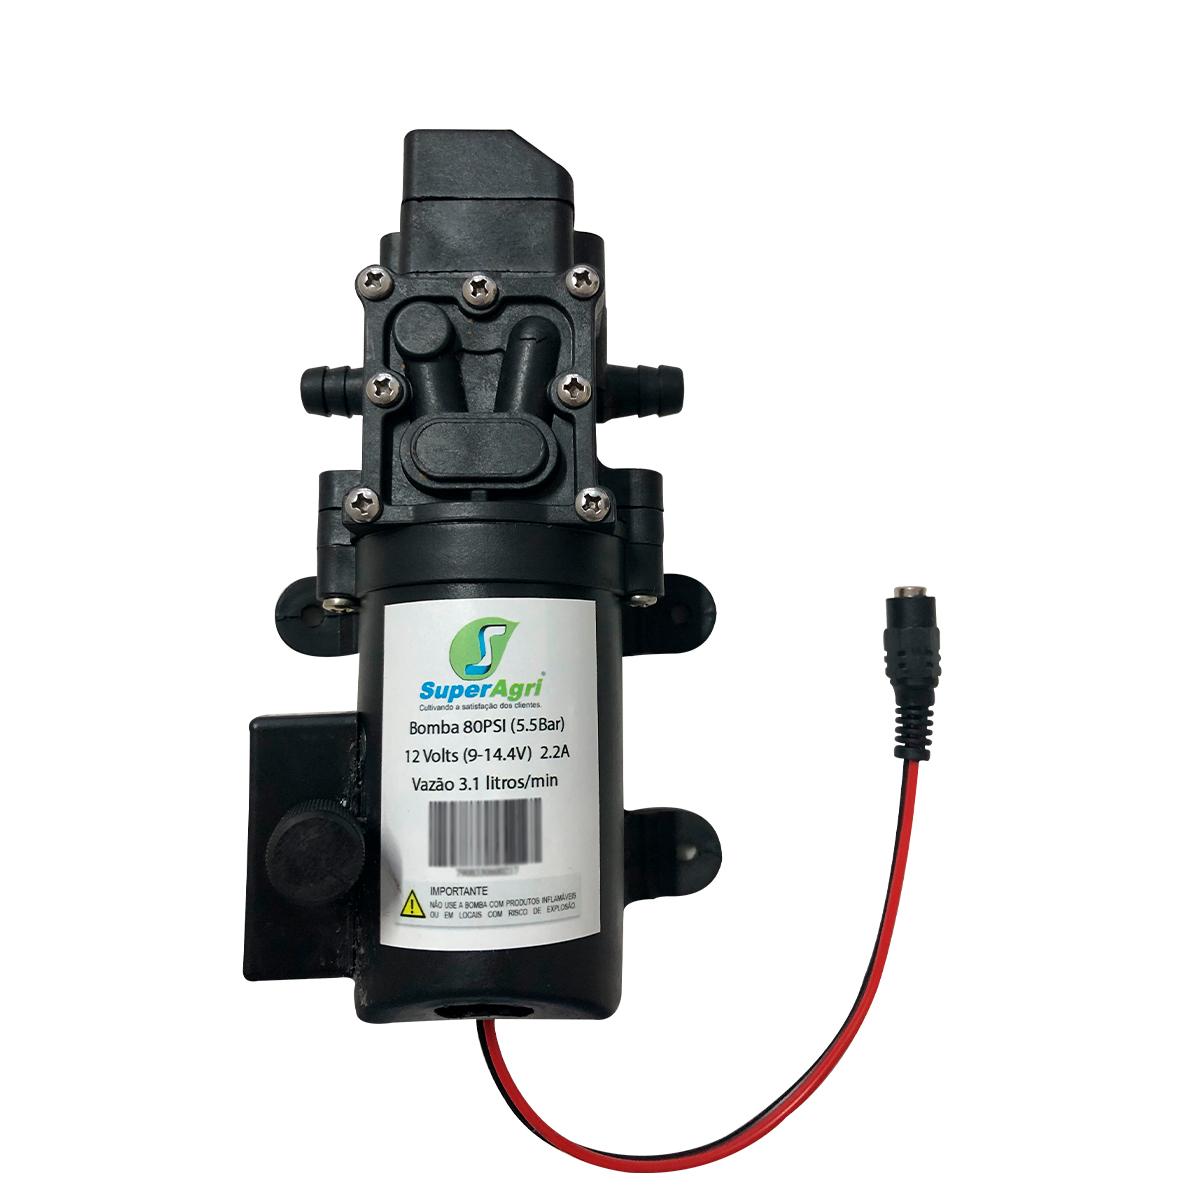 Bomba 80PSI + Fonte + Controle Pressão + Plug Energia